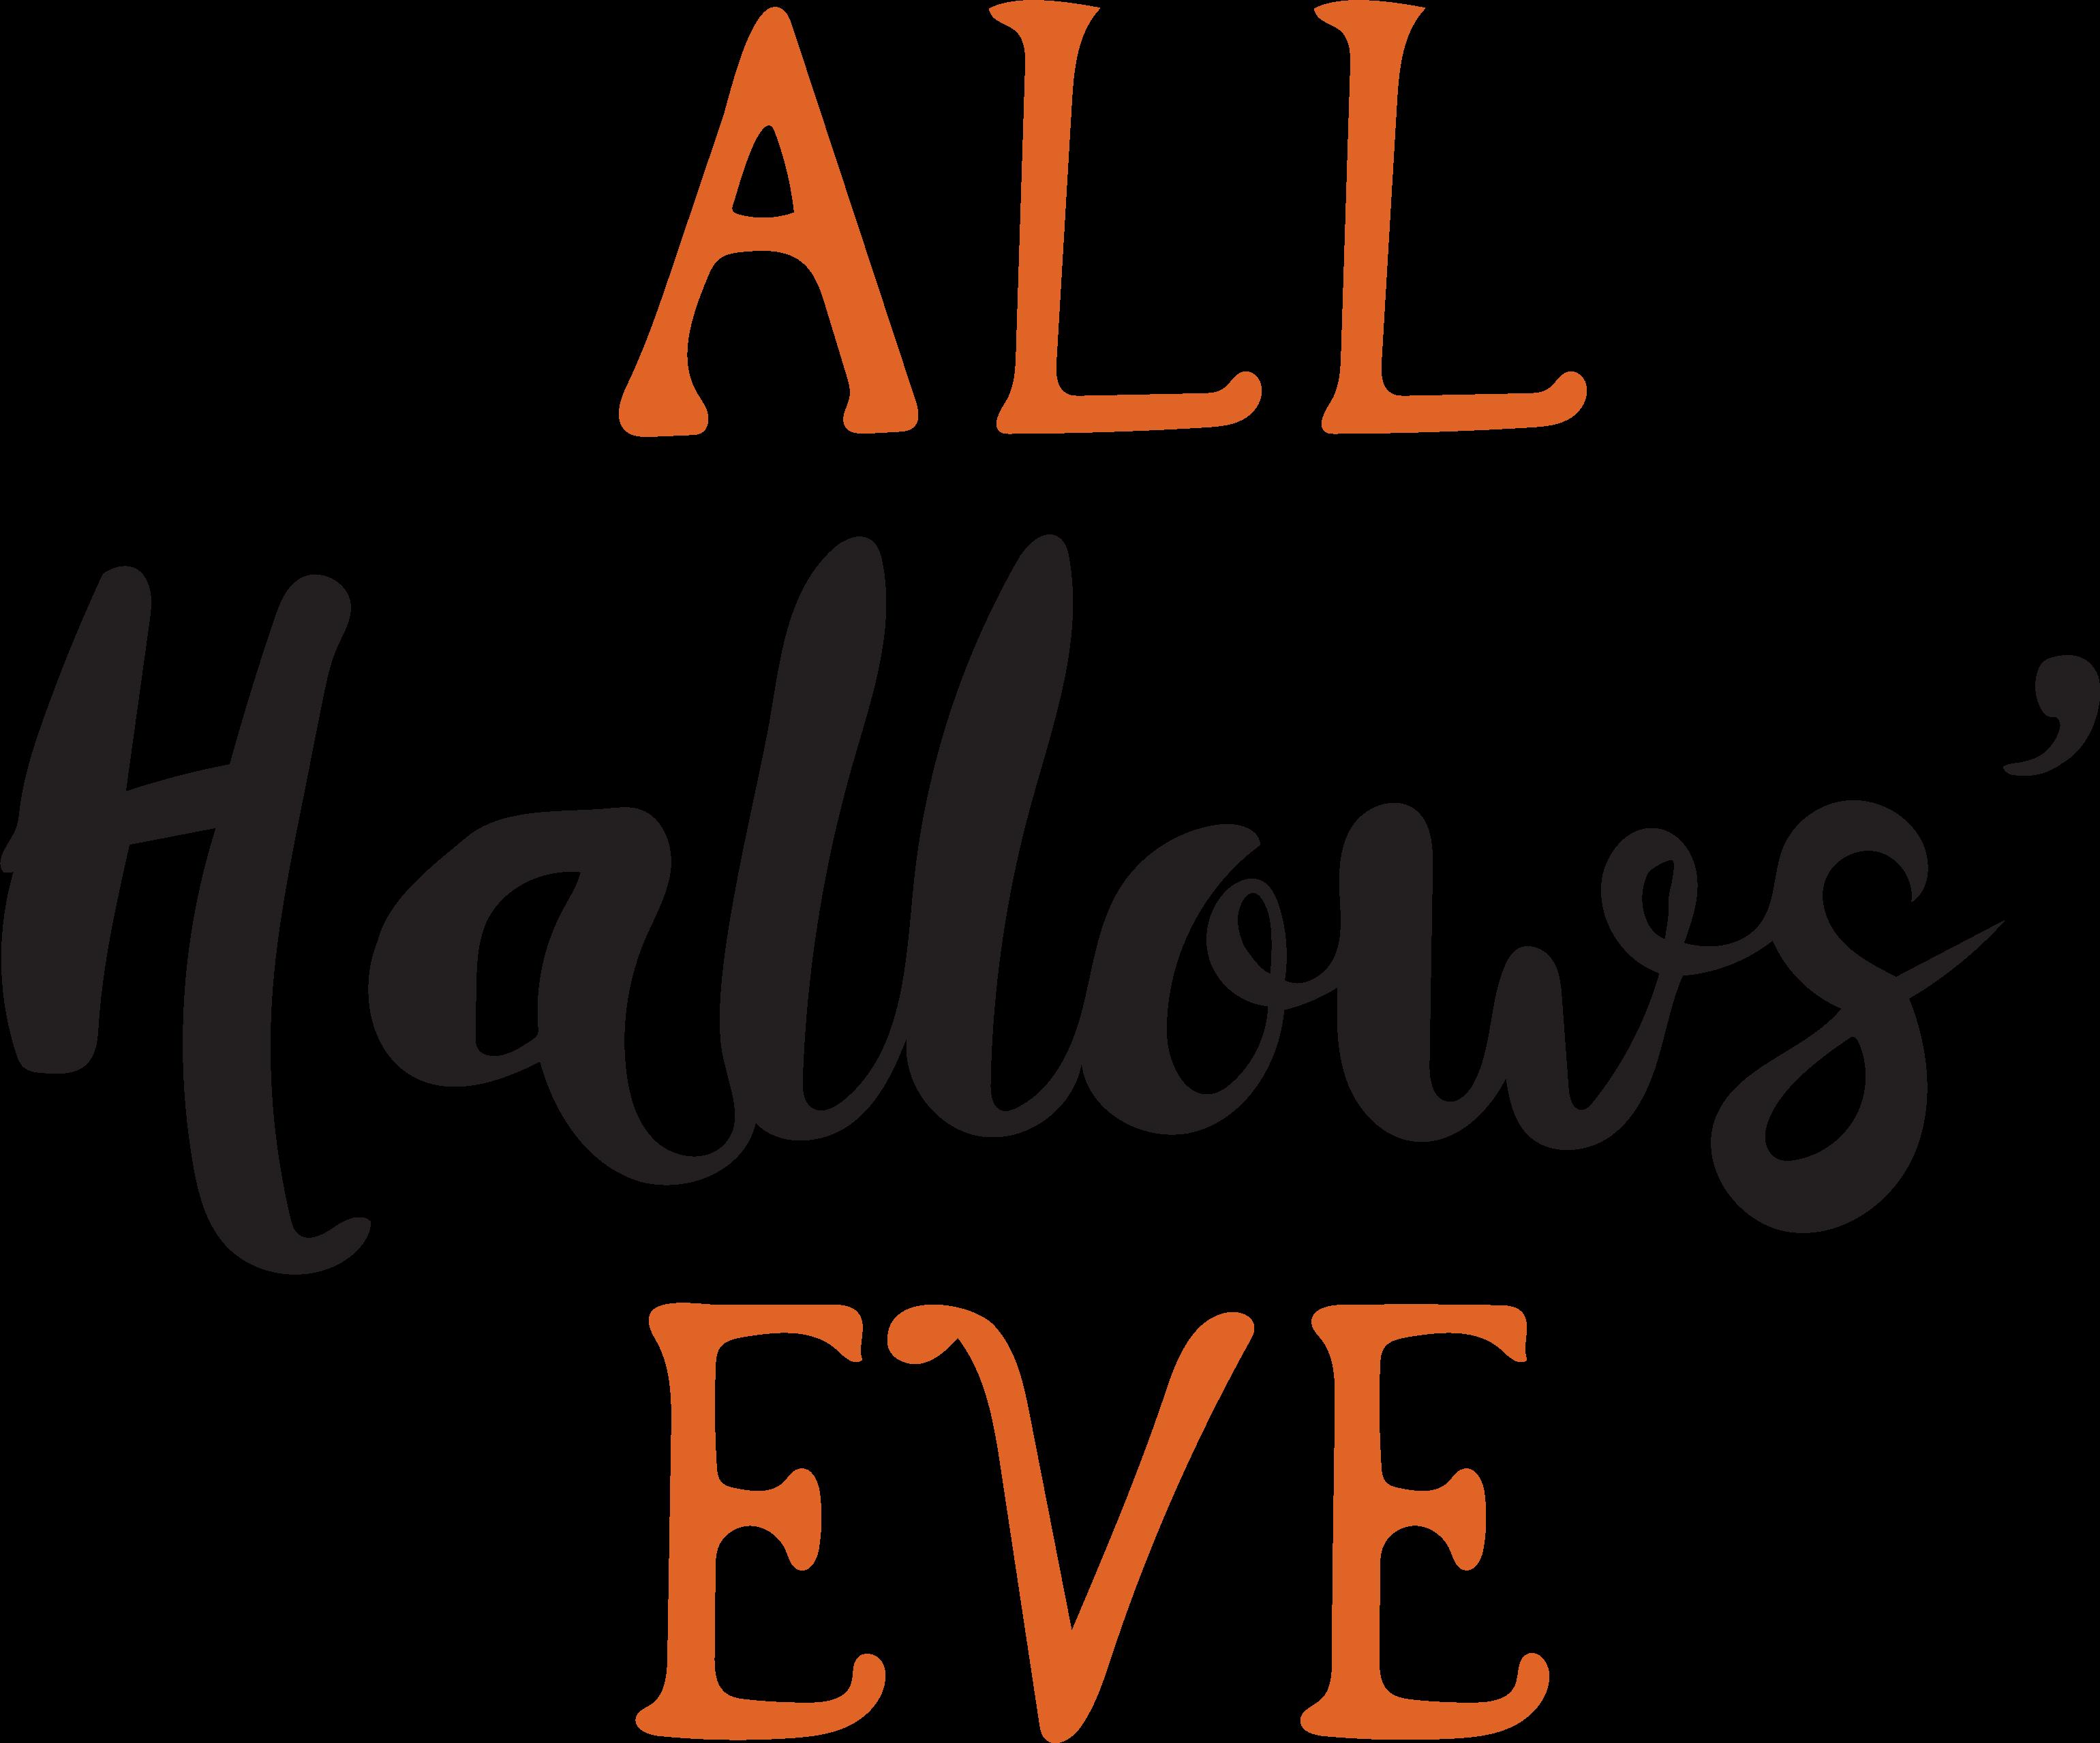 All Hallows' Eve SVG Cut File